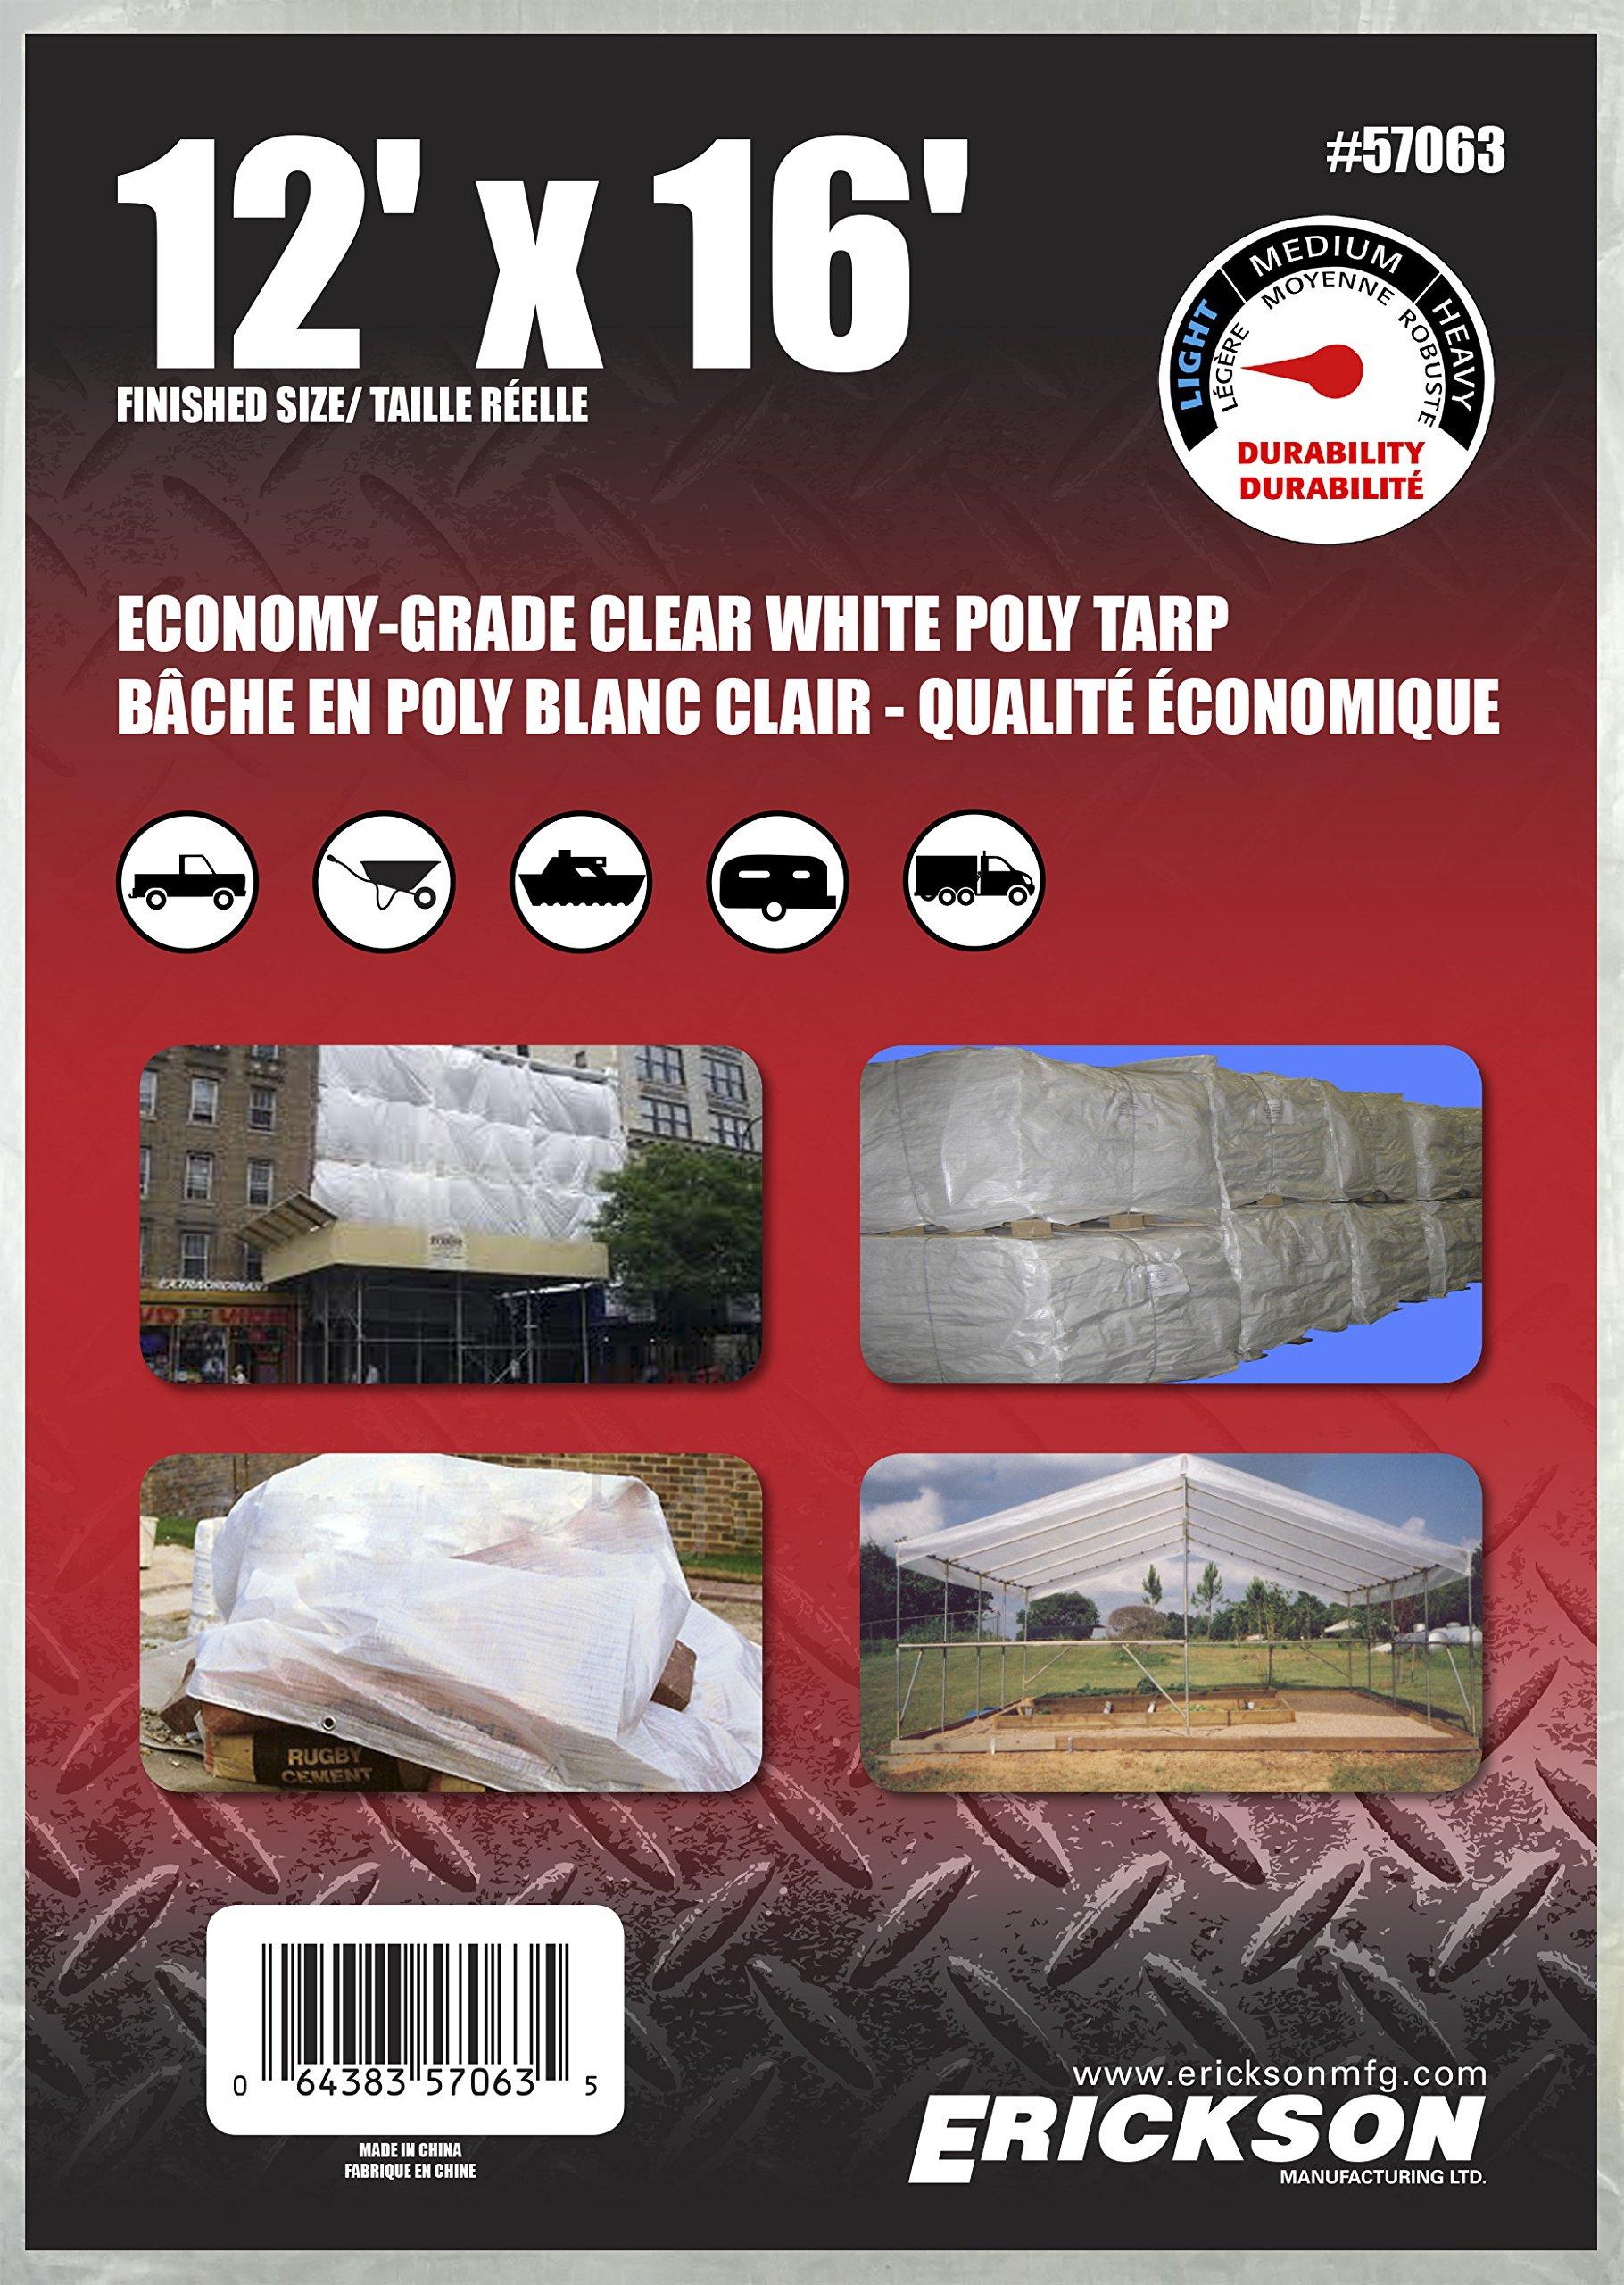 Erickson 57063 Clear White Economy Grade Poly Tarp, 12' x 16', 1 Pack